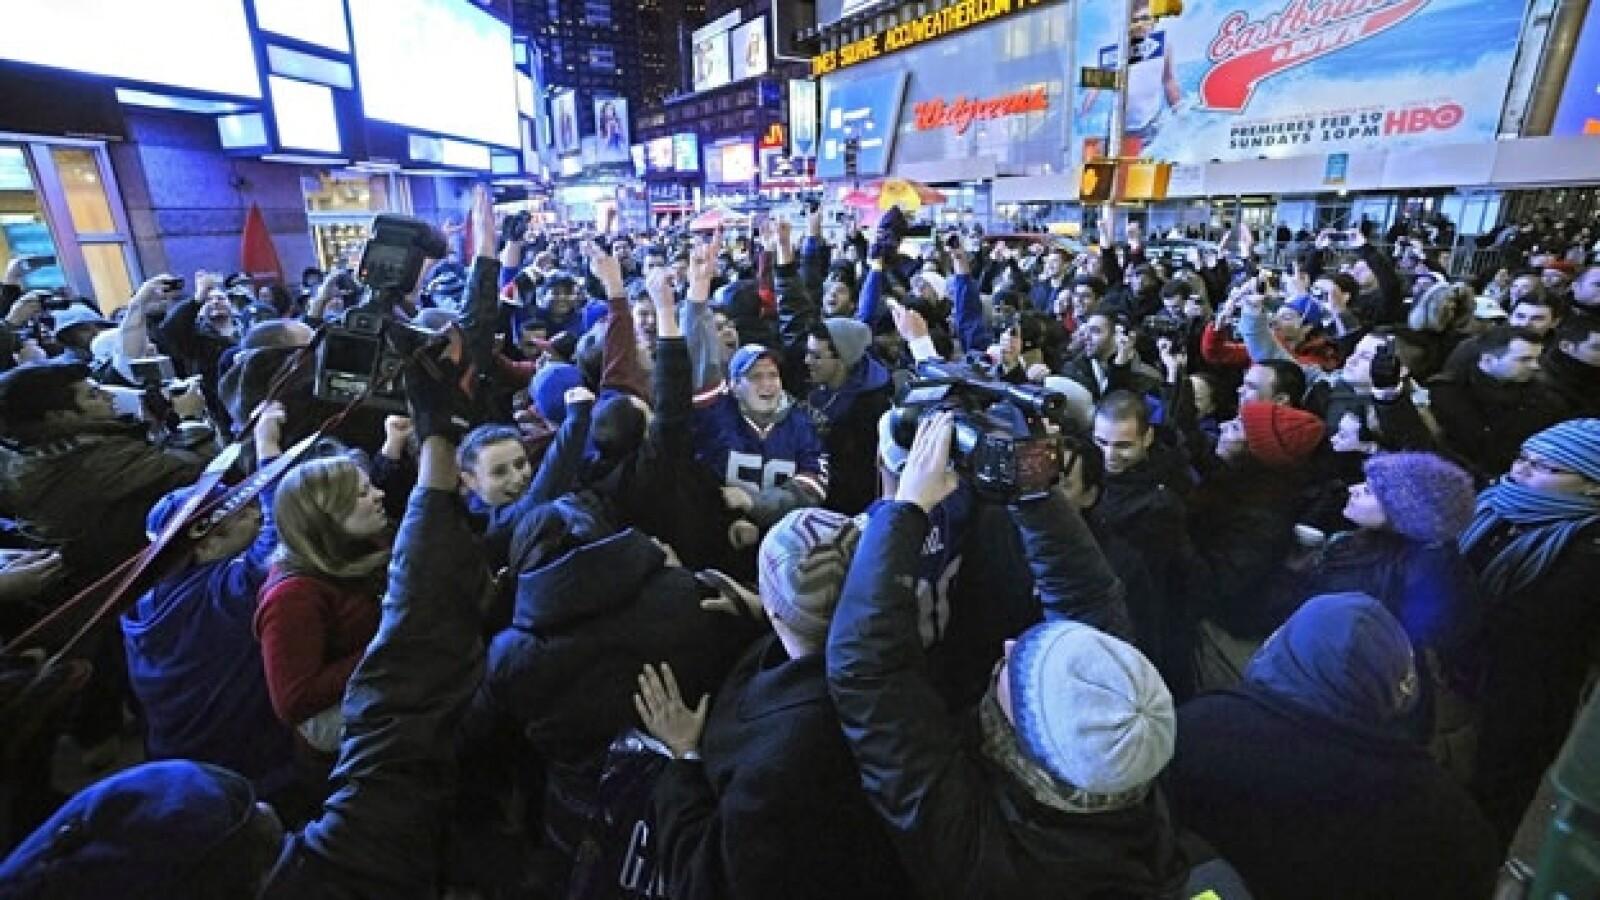 celebracion gigantes festejos super bowl nueva york